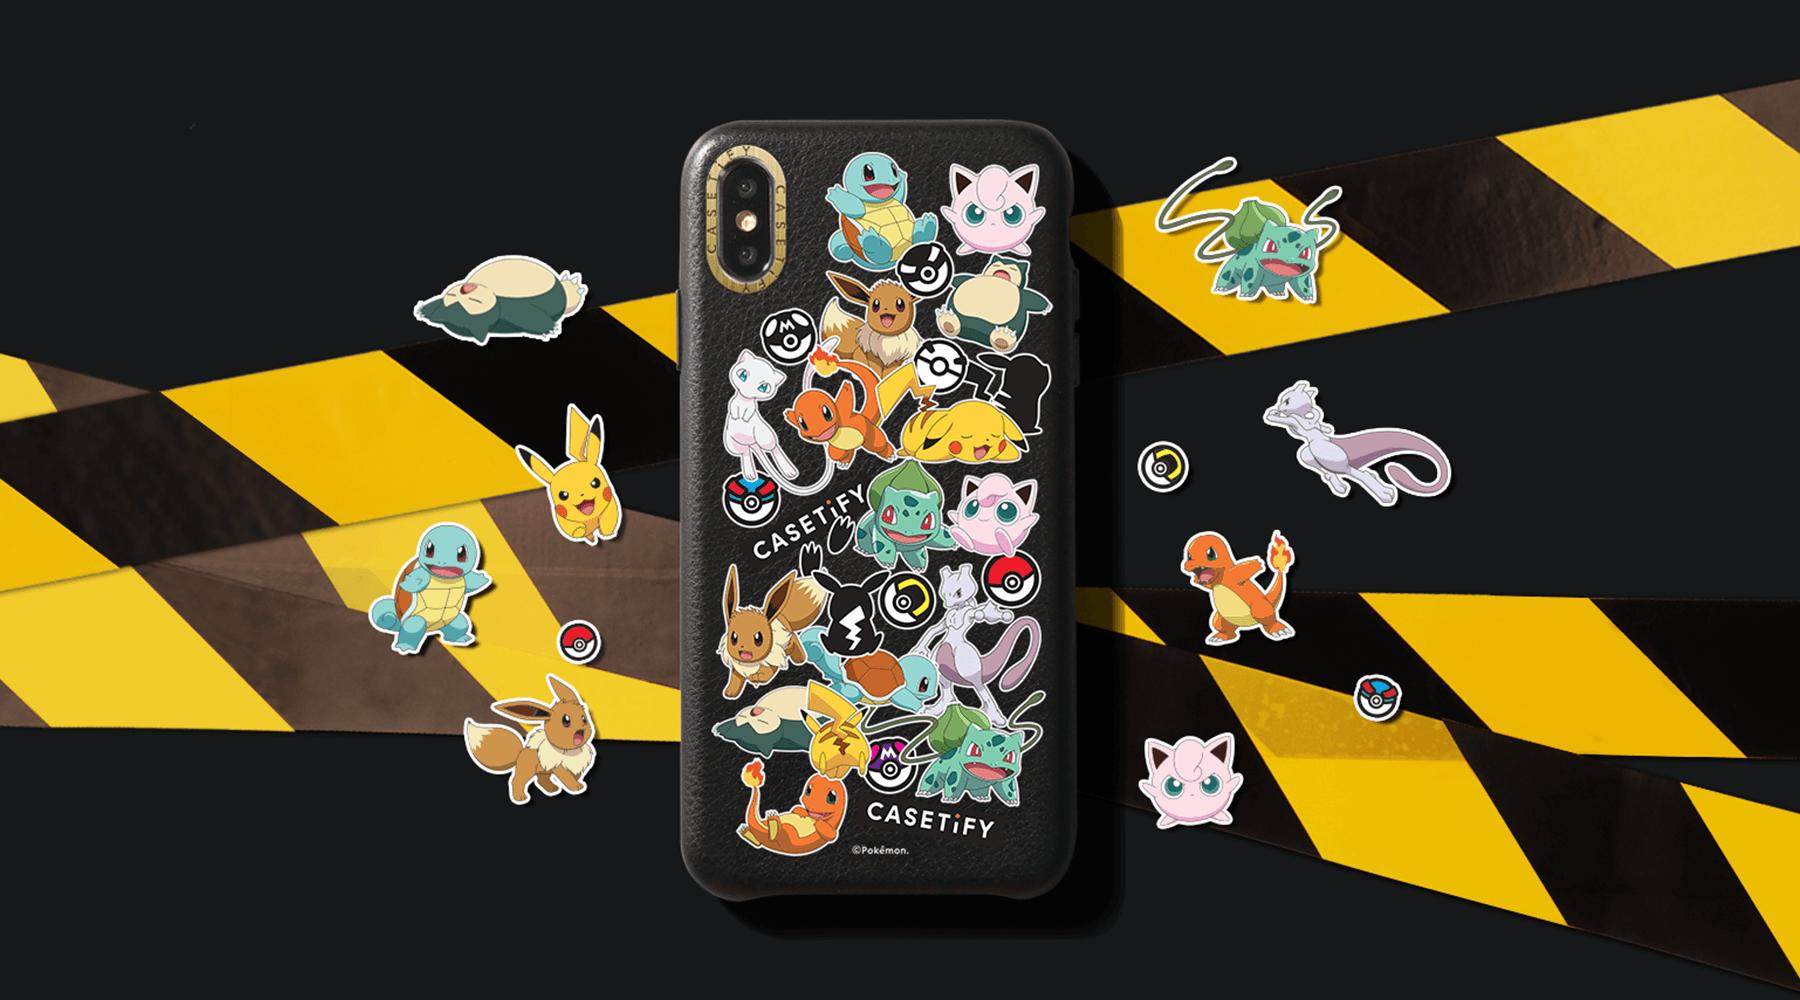 Pokemon casetify limited edition case